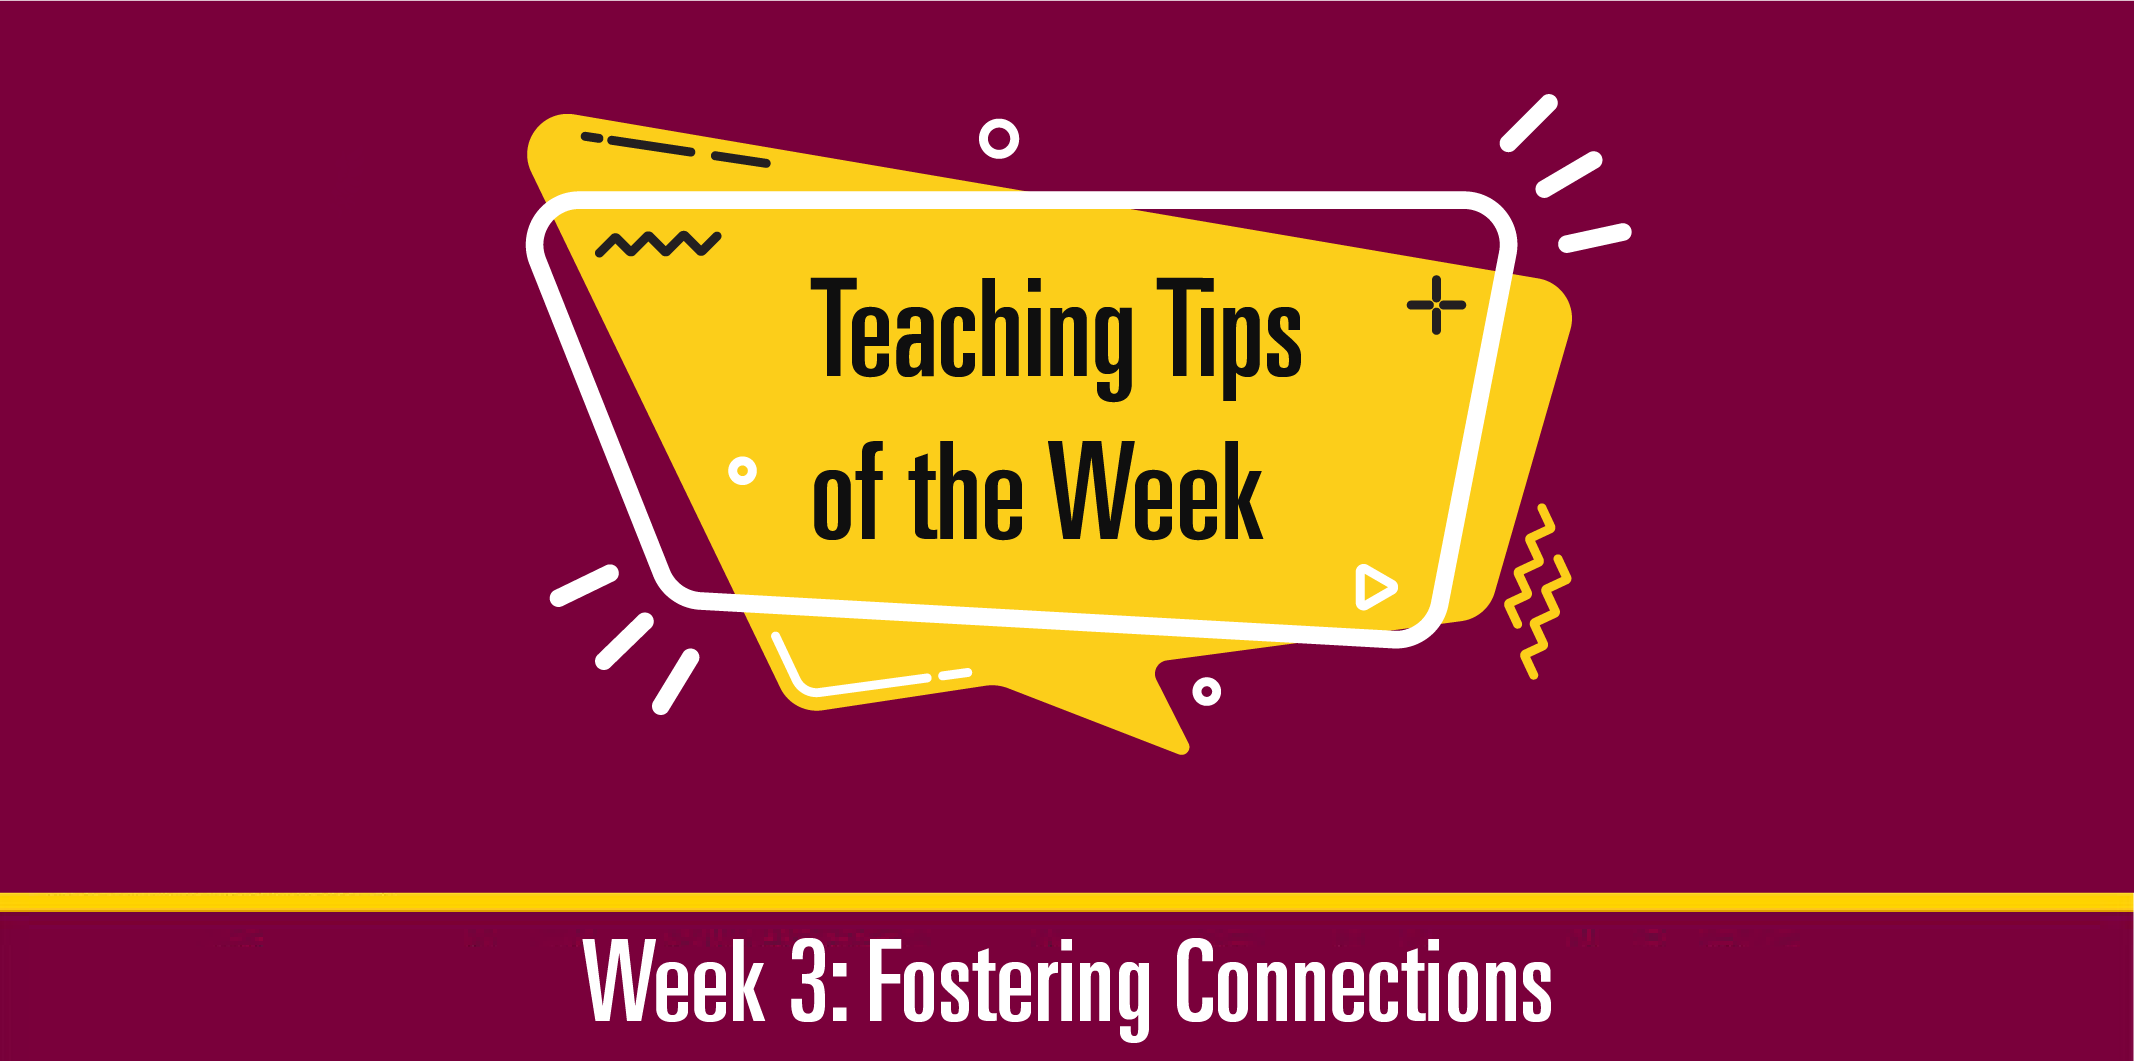 Teaching Tips 3